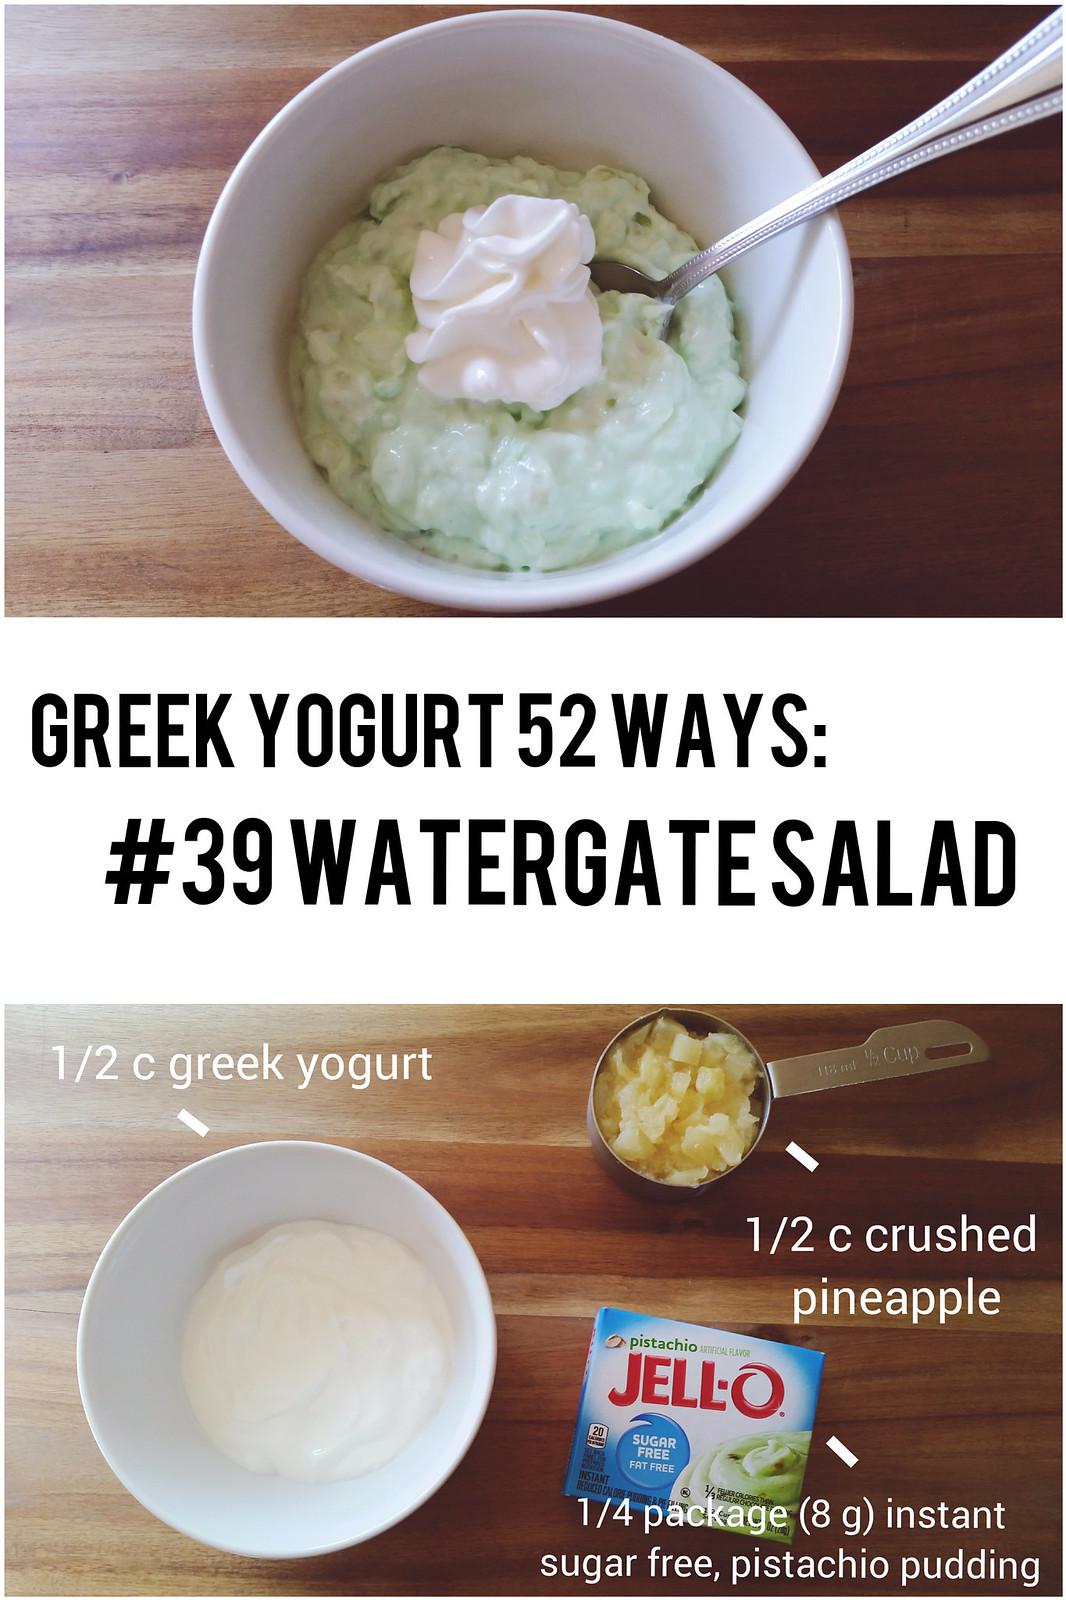 greek yogurt 52 ways: # 39 watergate salad